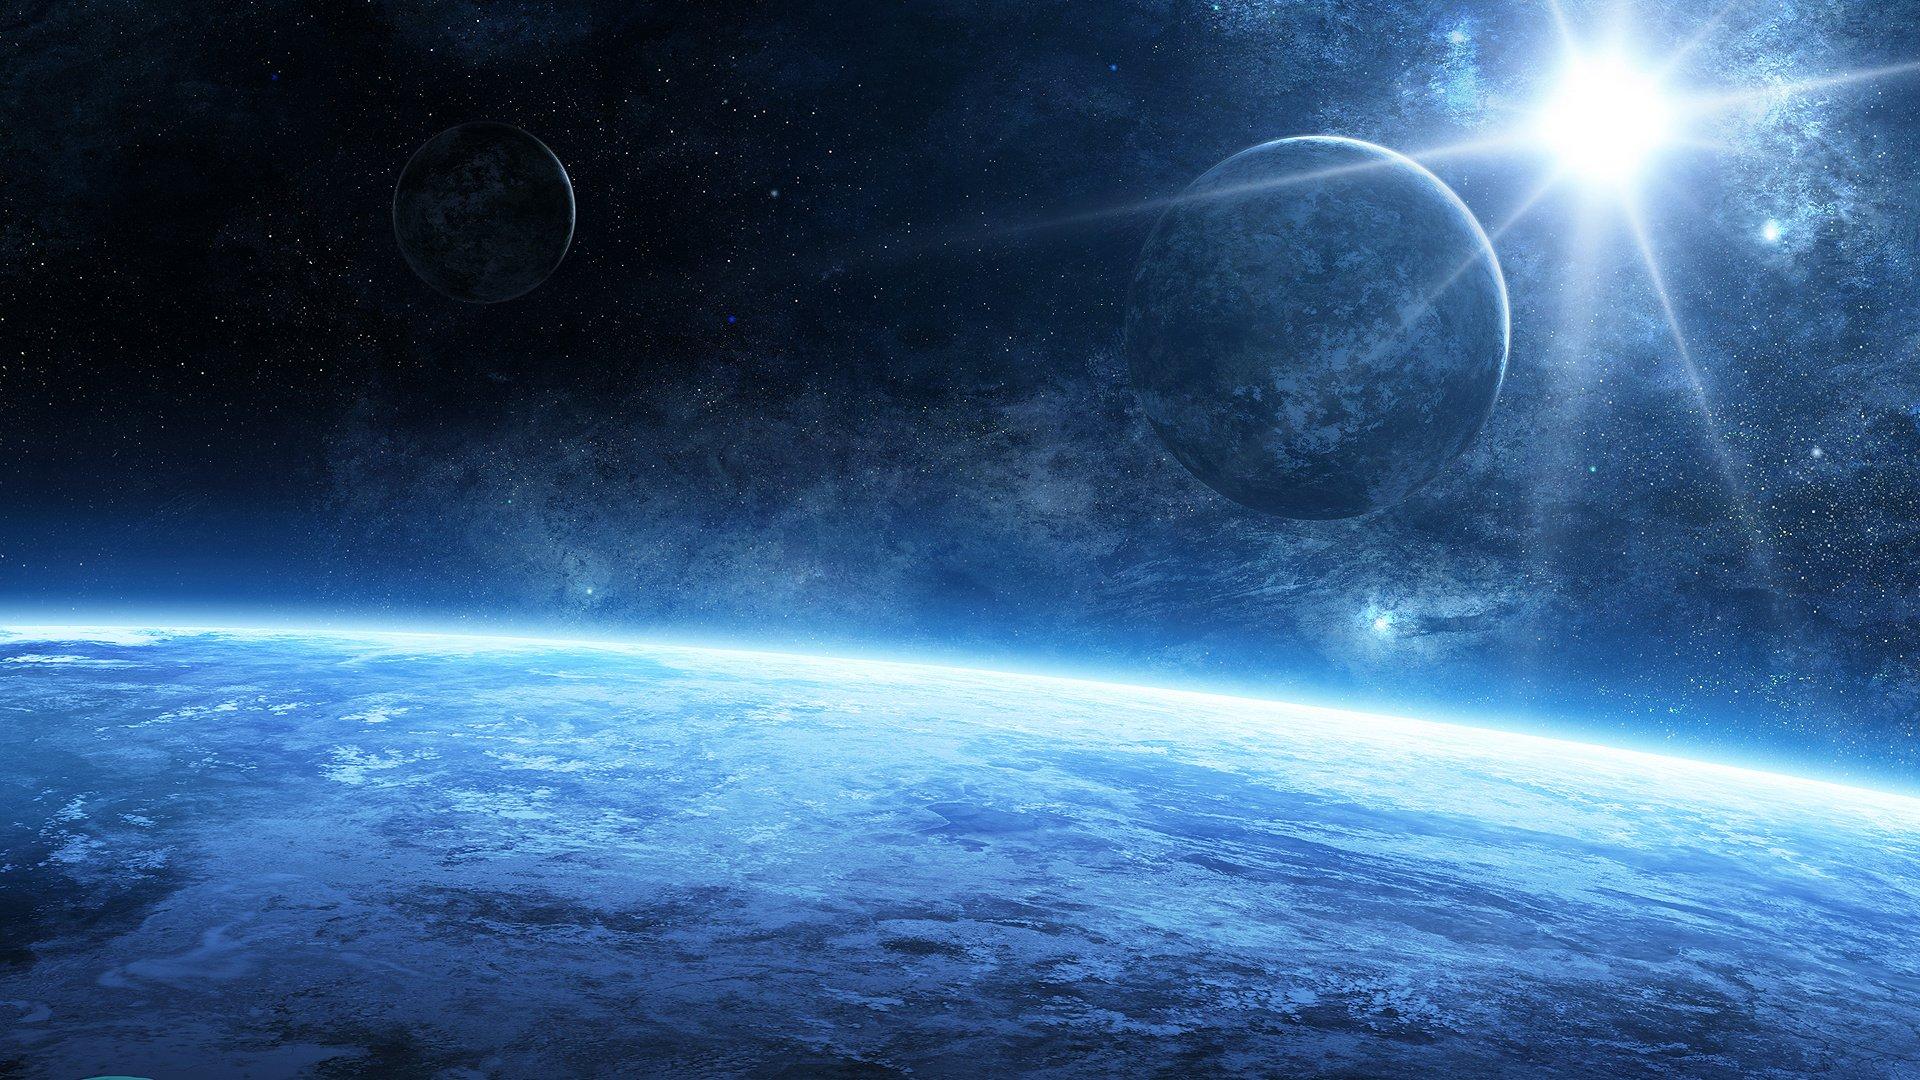 universe stars galaxies planets - photo #25